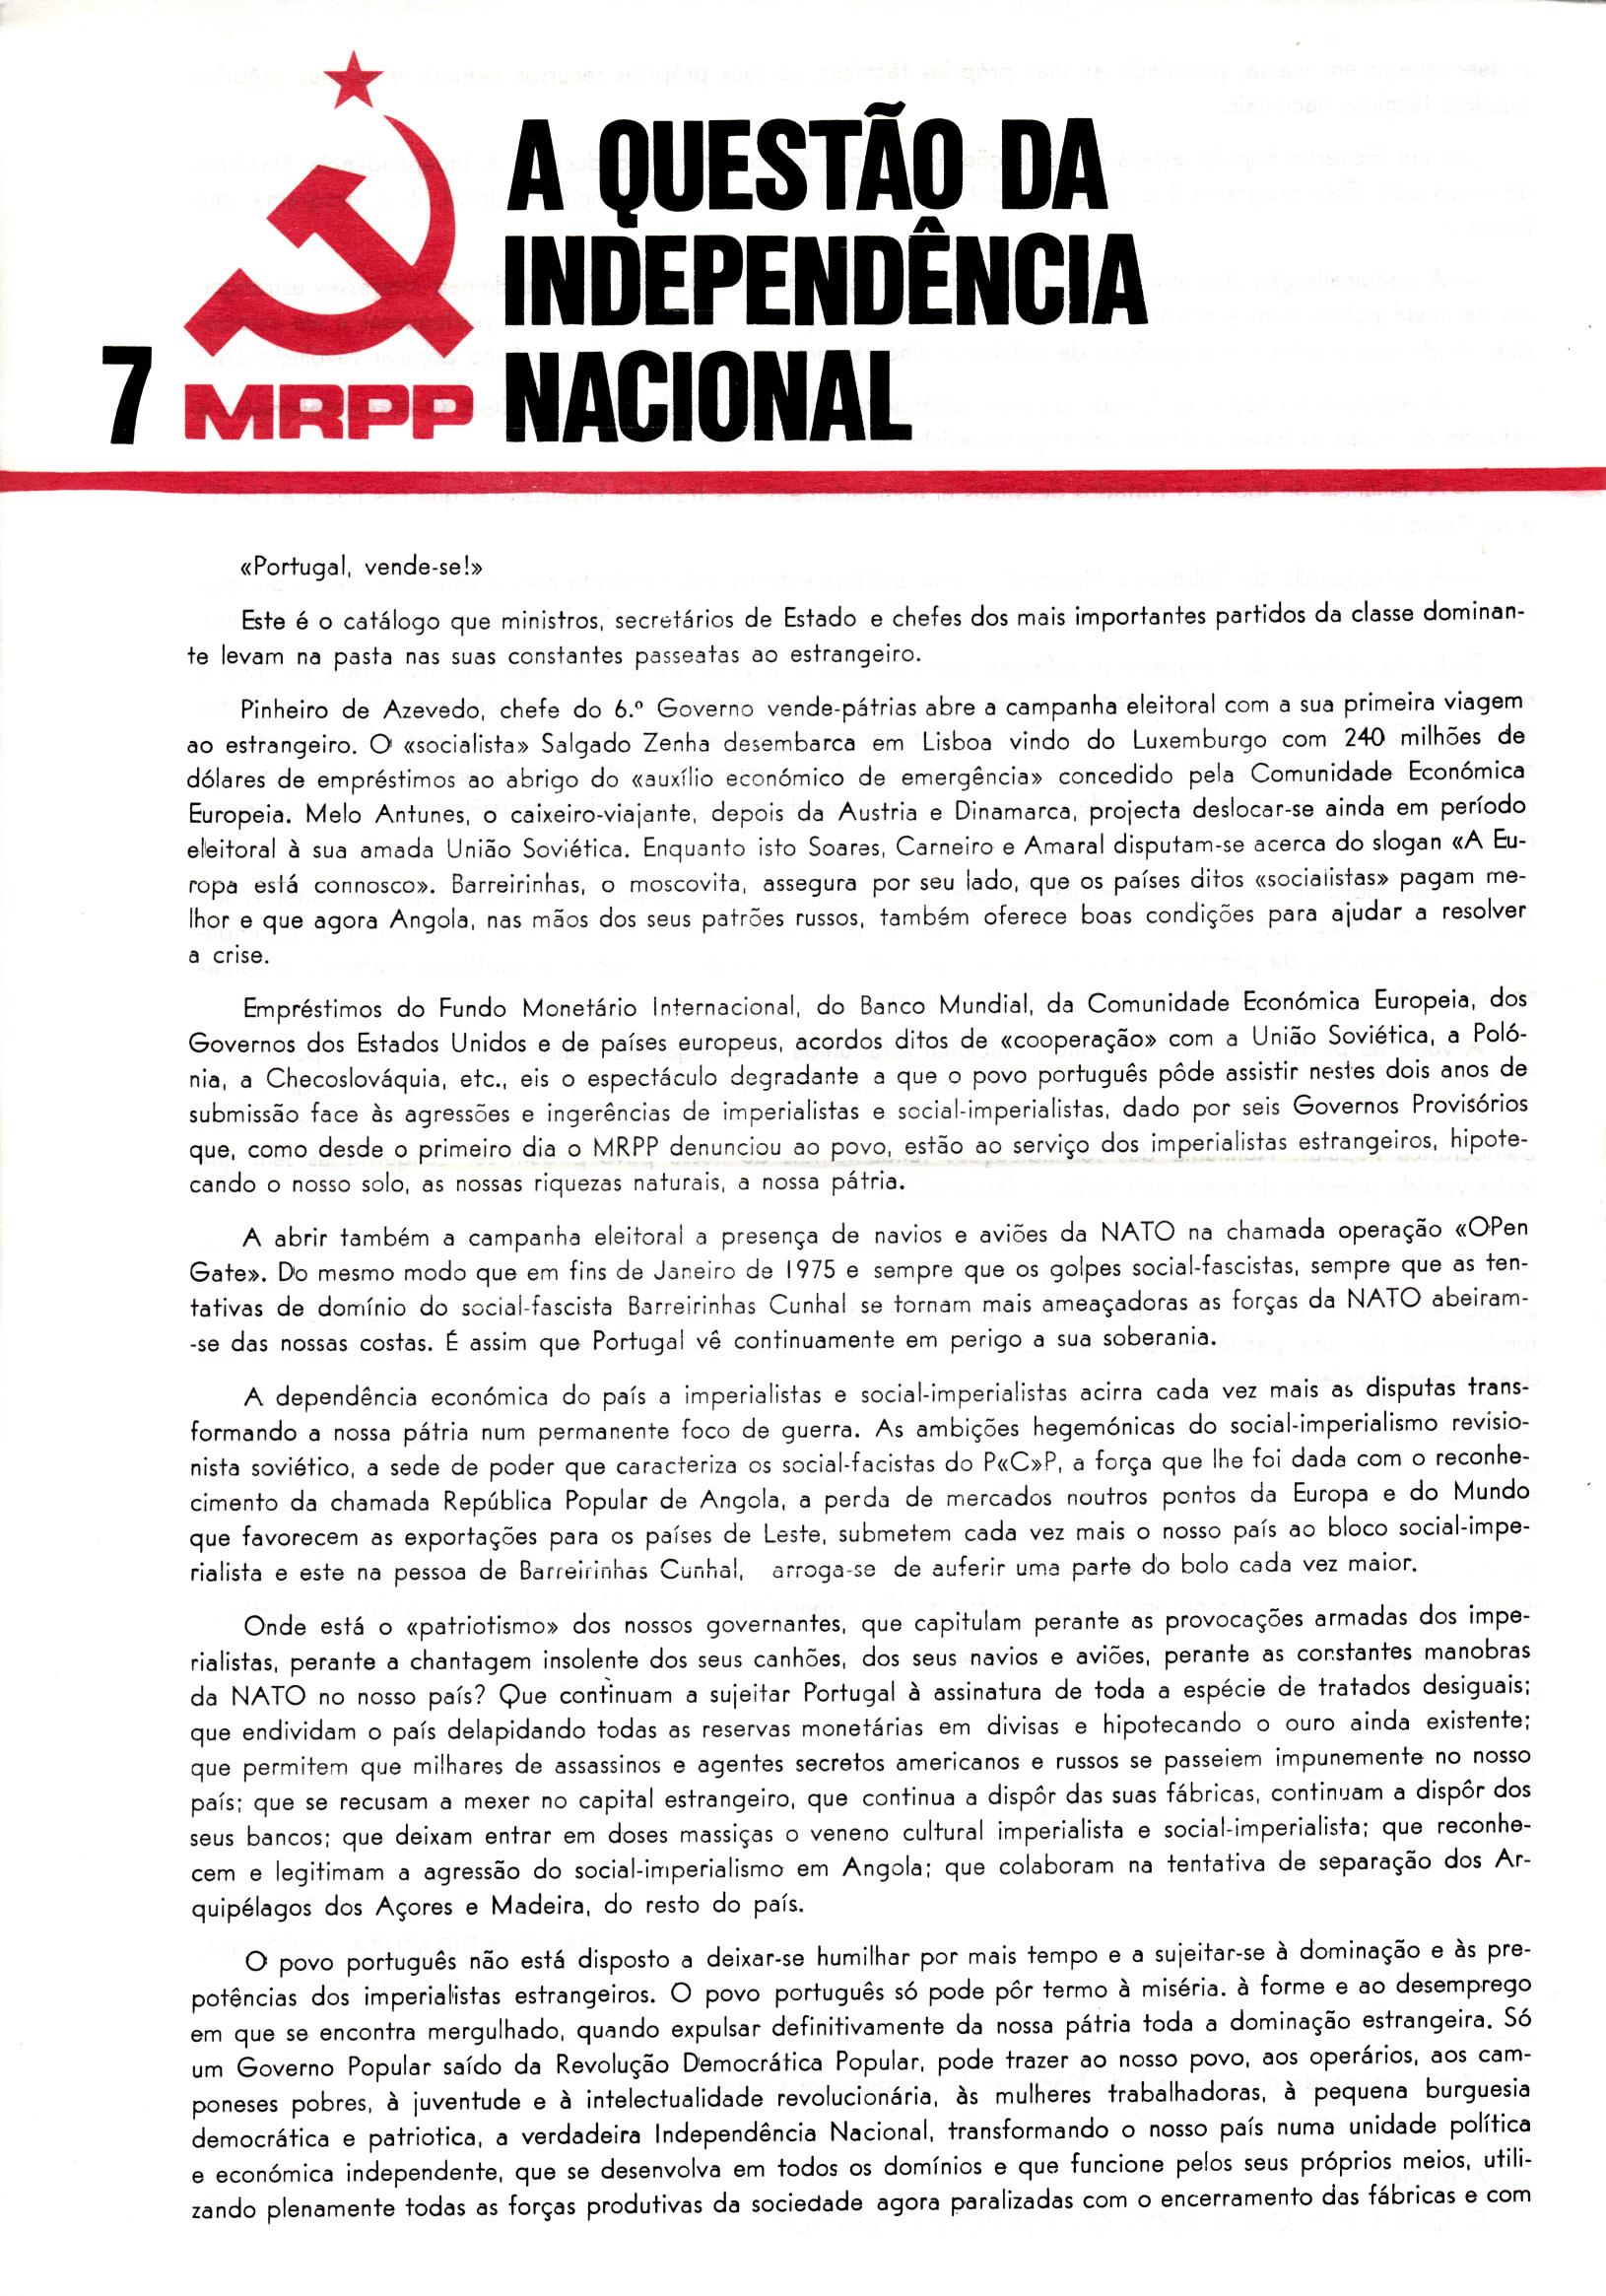 mrpp_1976_eleicao_programa_0013